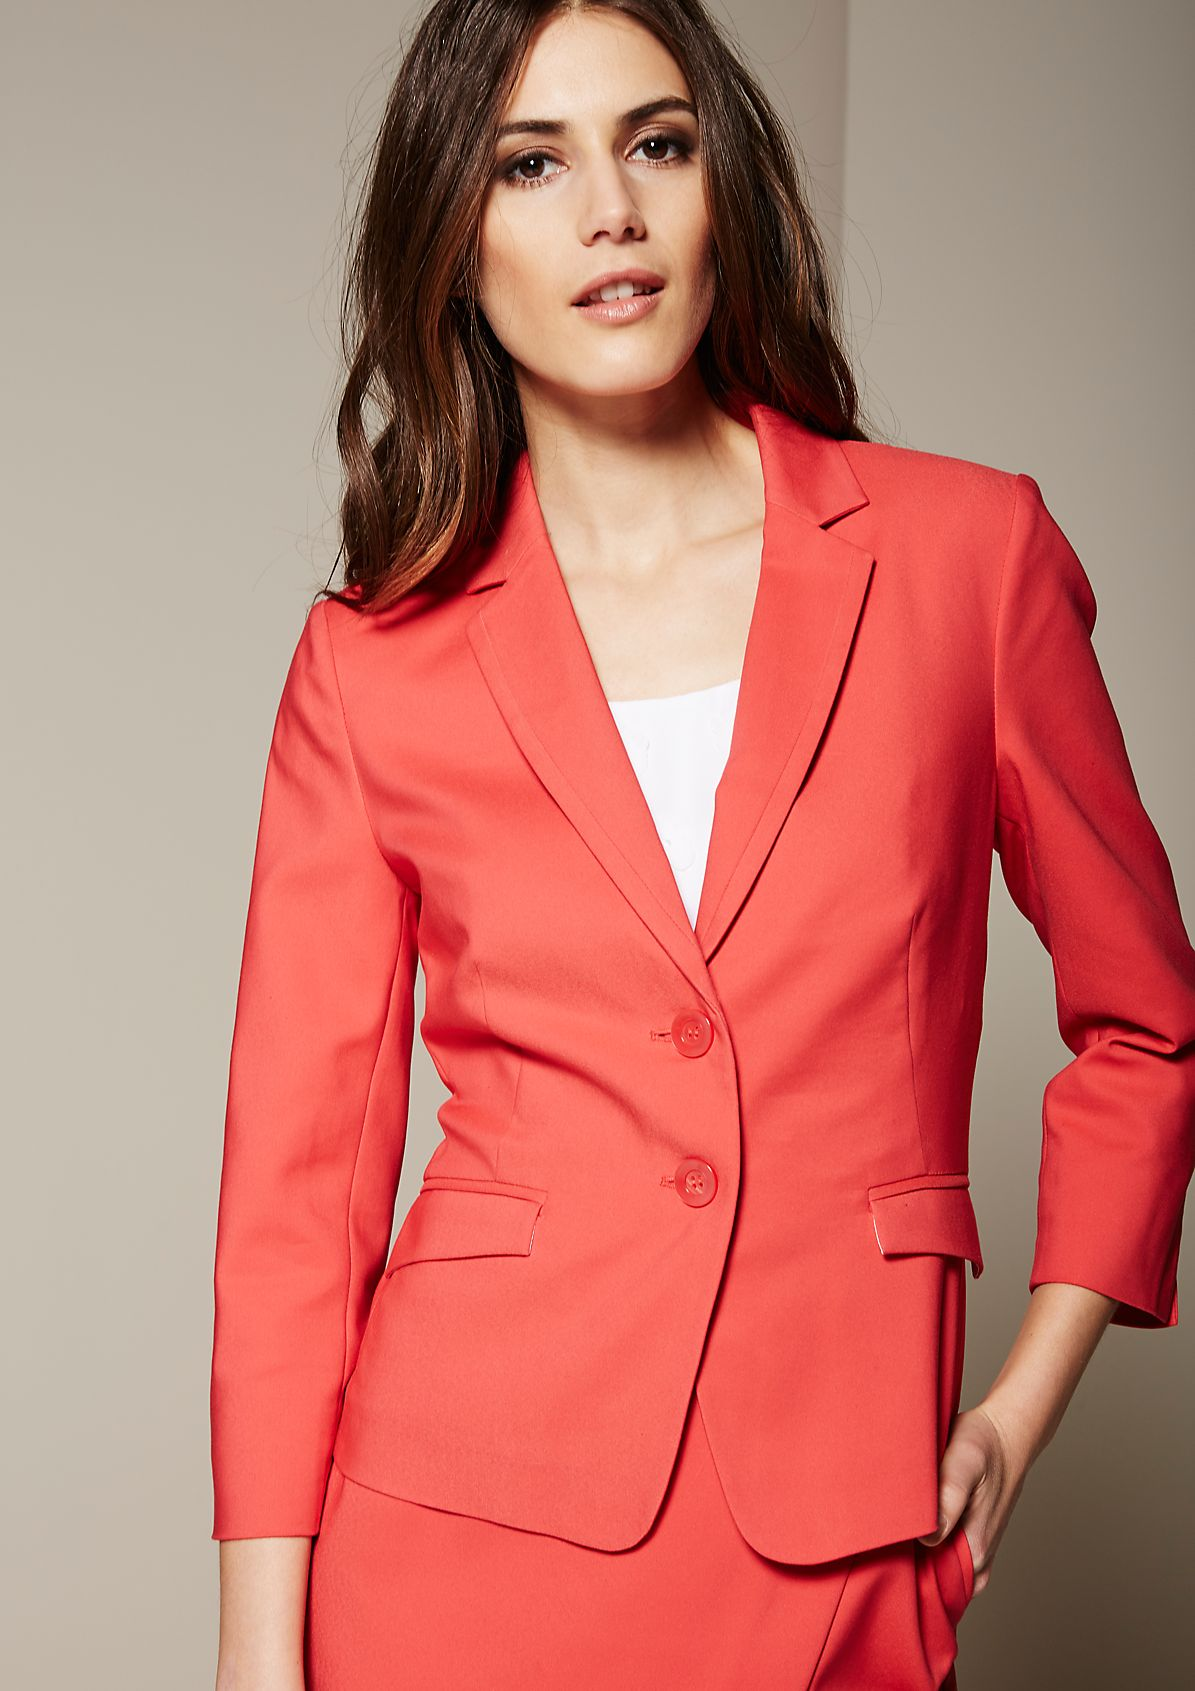 Lightweight summer blazer with elegant details from s.Oliver